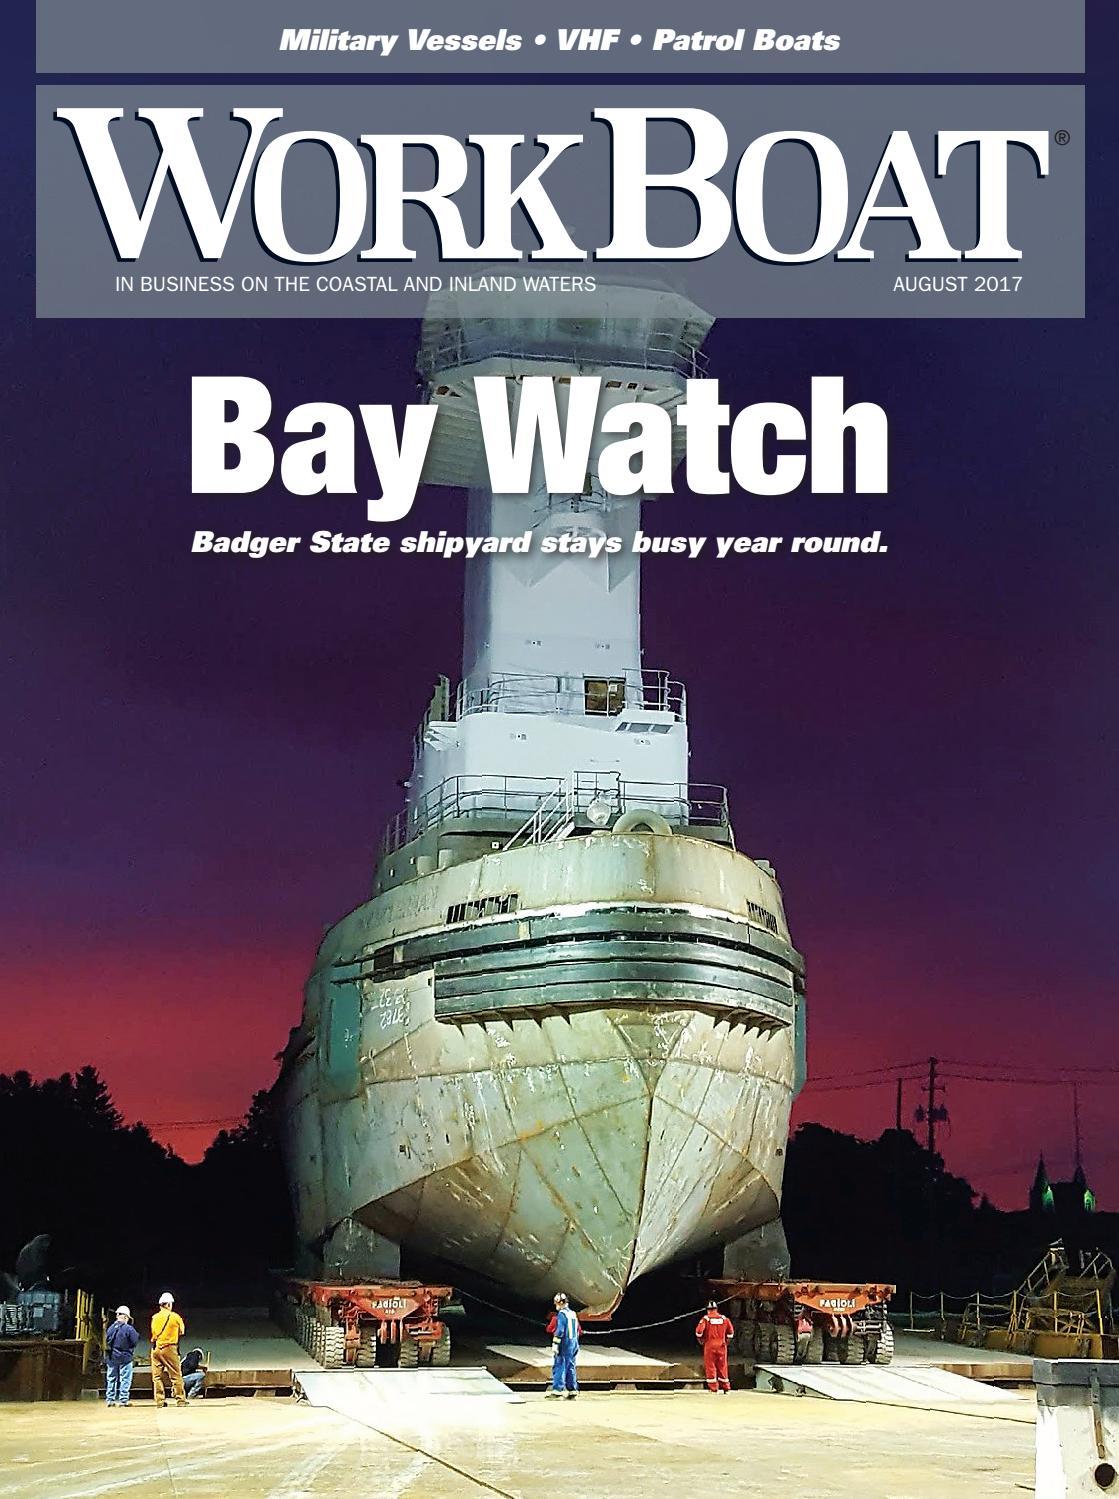 WorkBoat August 2017 by WorkBoat - issuu